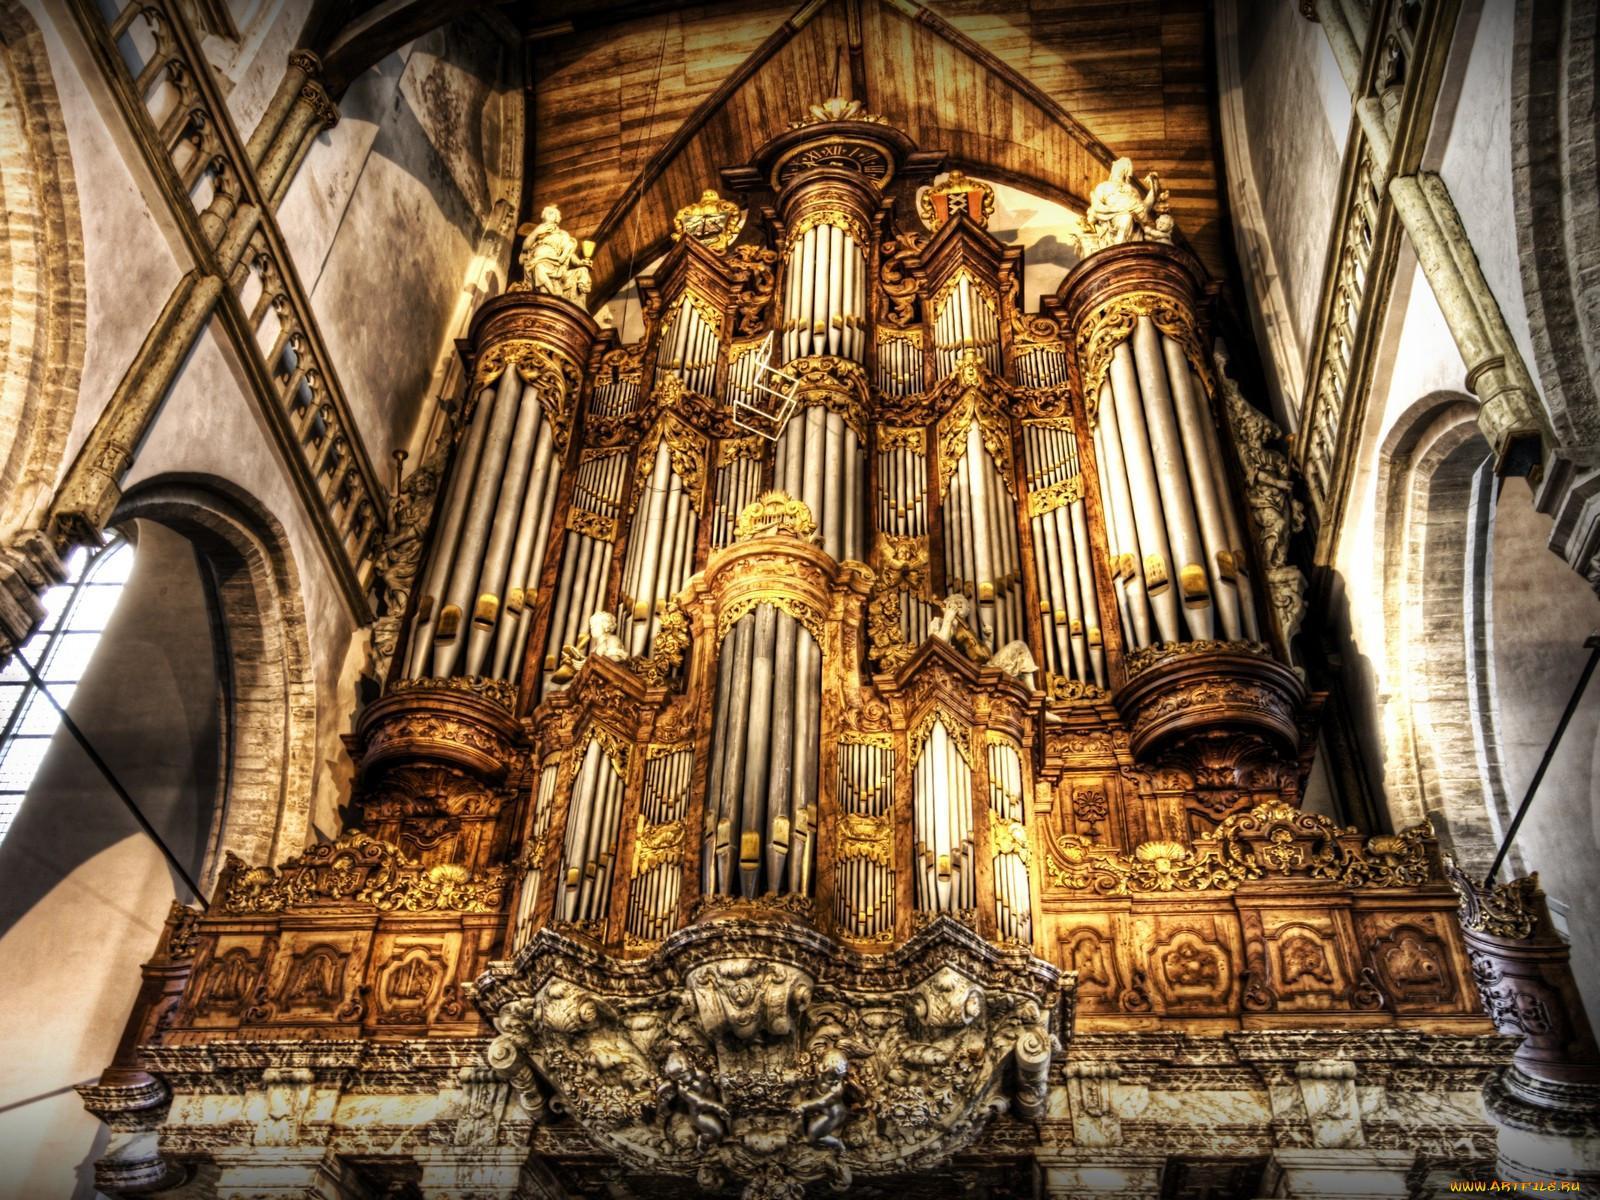 Organ музыка музыкальные инструменты